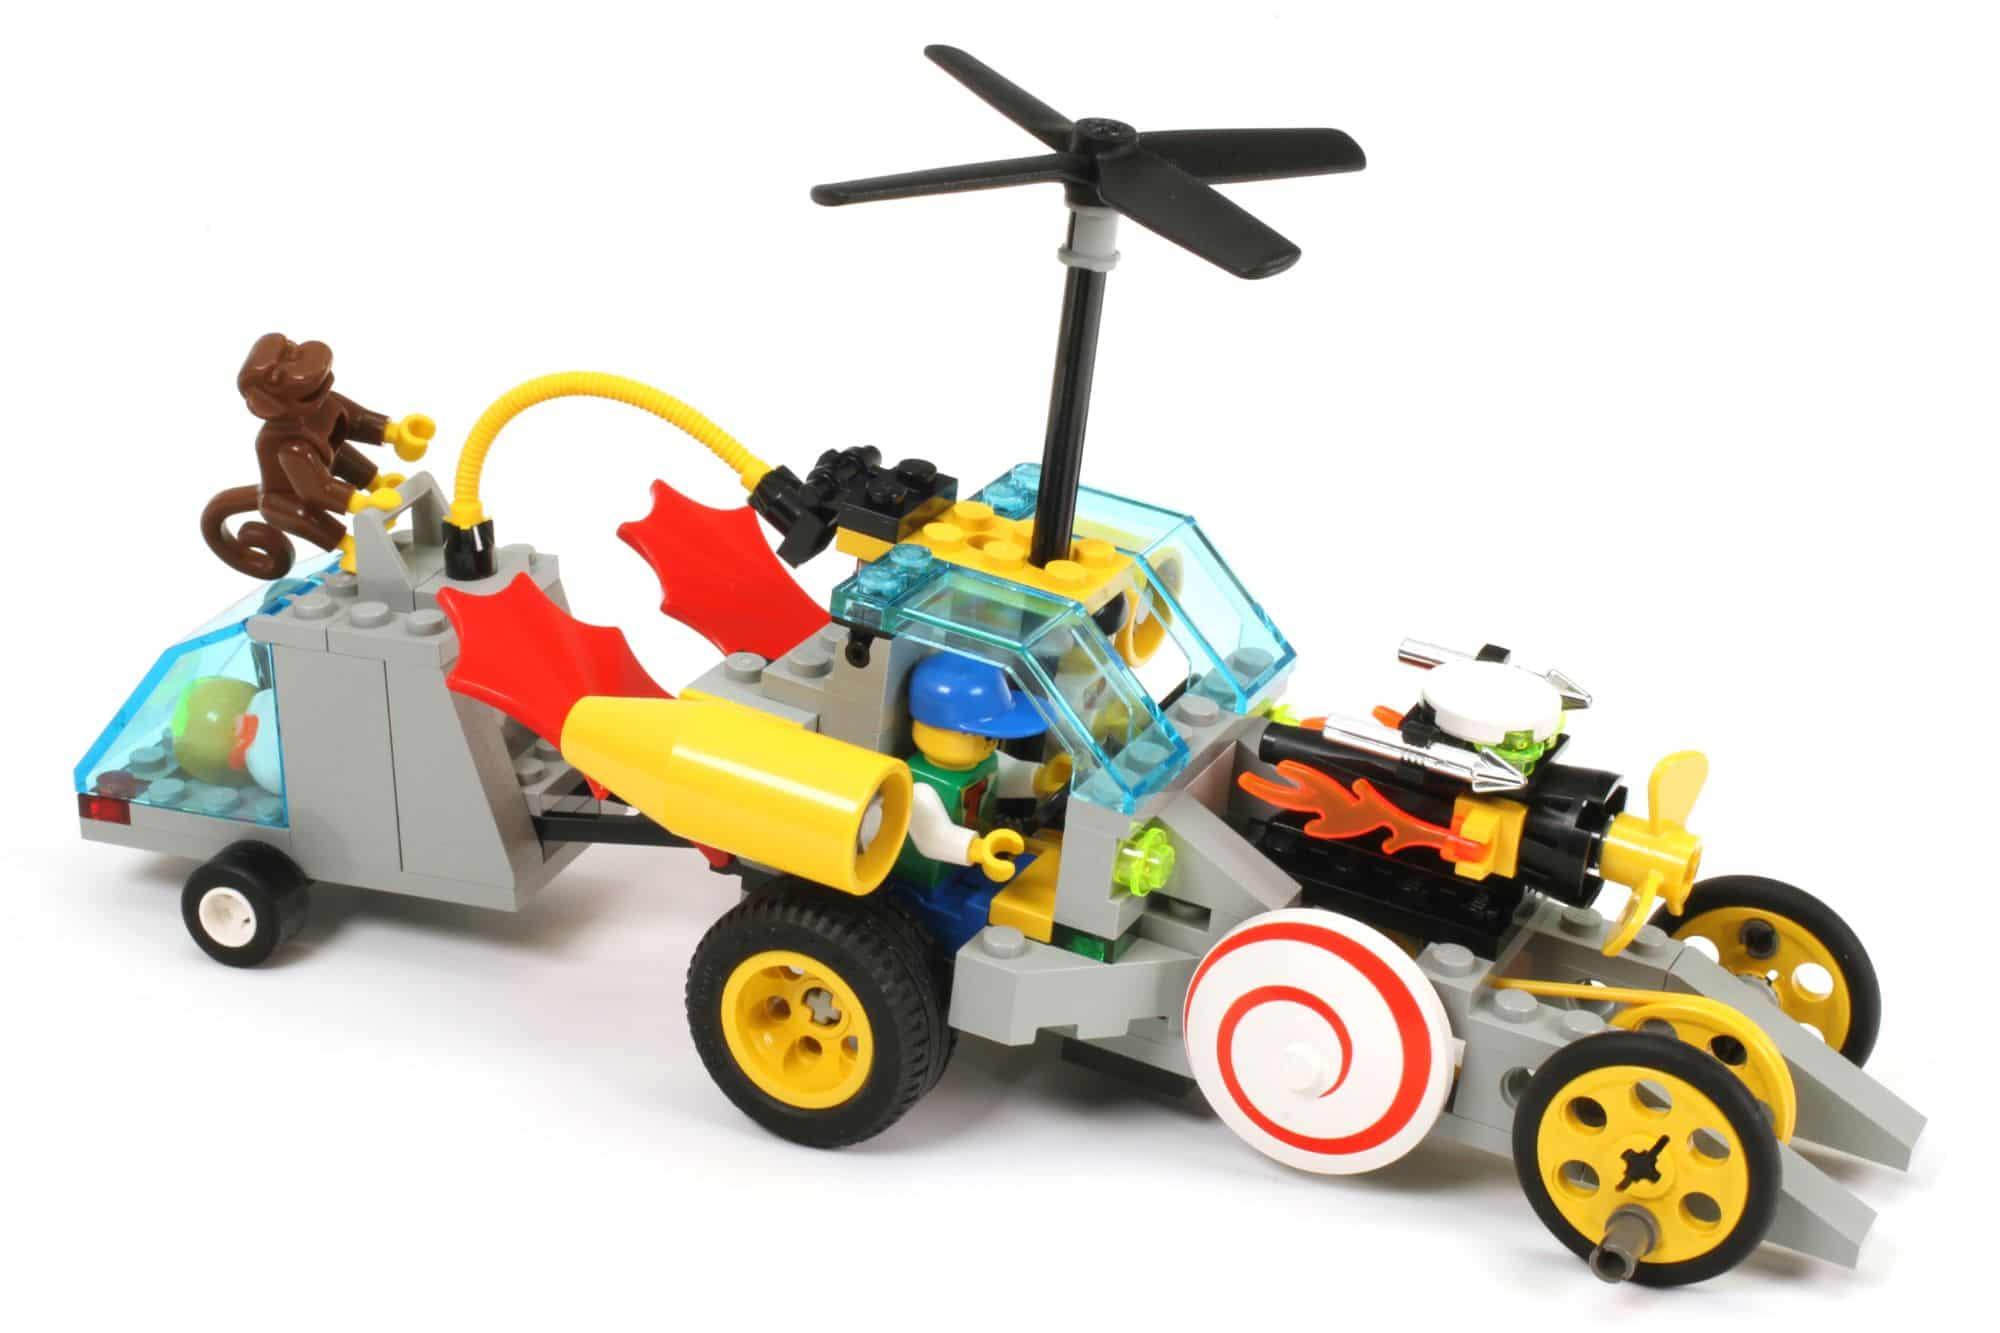 LEGO Time Cruisers 6492 Time Cruiser Navigator 7